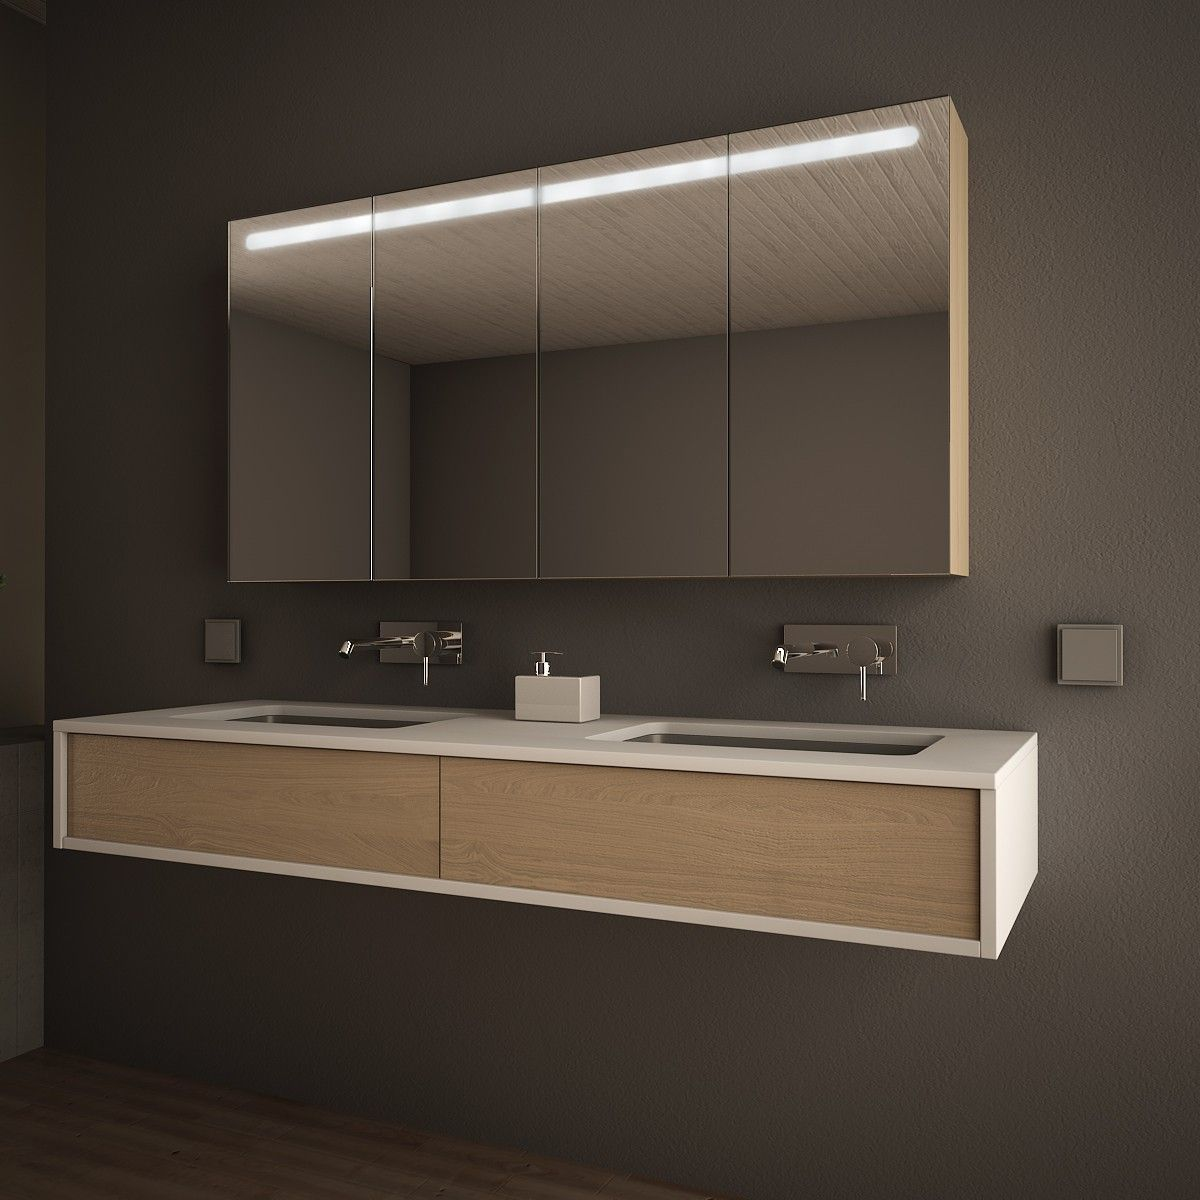 Spiegelschrank Mit Holz Korpus Riga Jetzt Bestellen Unter Https Moebel Ladendirekt De Bad Badmoeb Badezimmer Spiegelschrank Spiegelschrank Badspiegelschrank